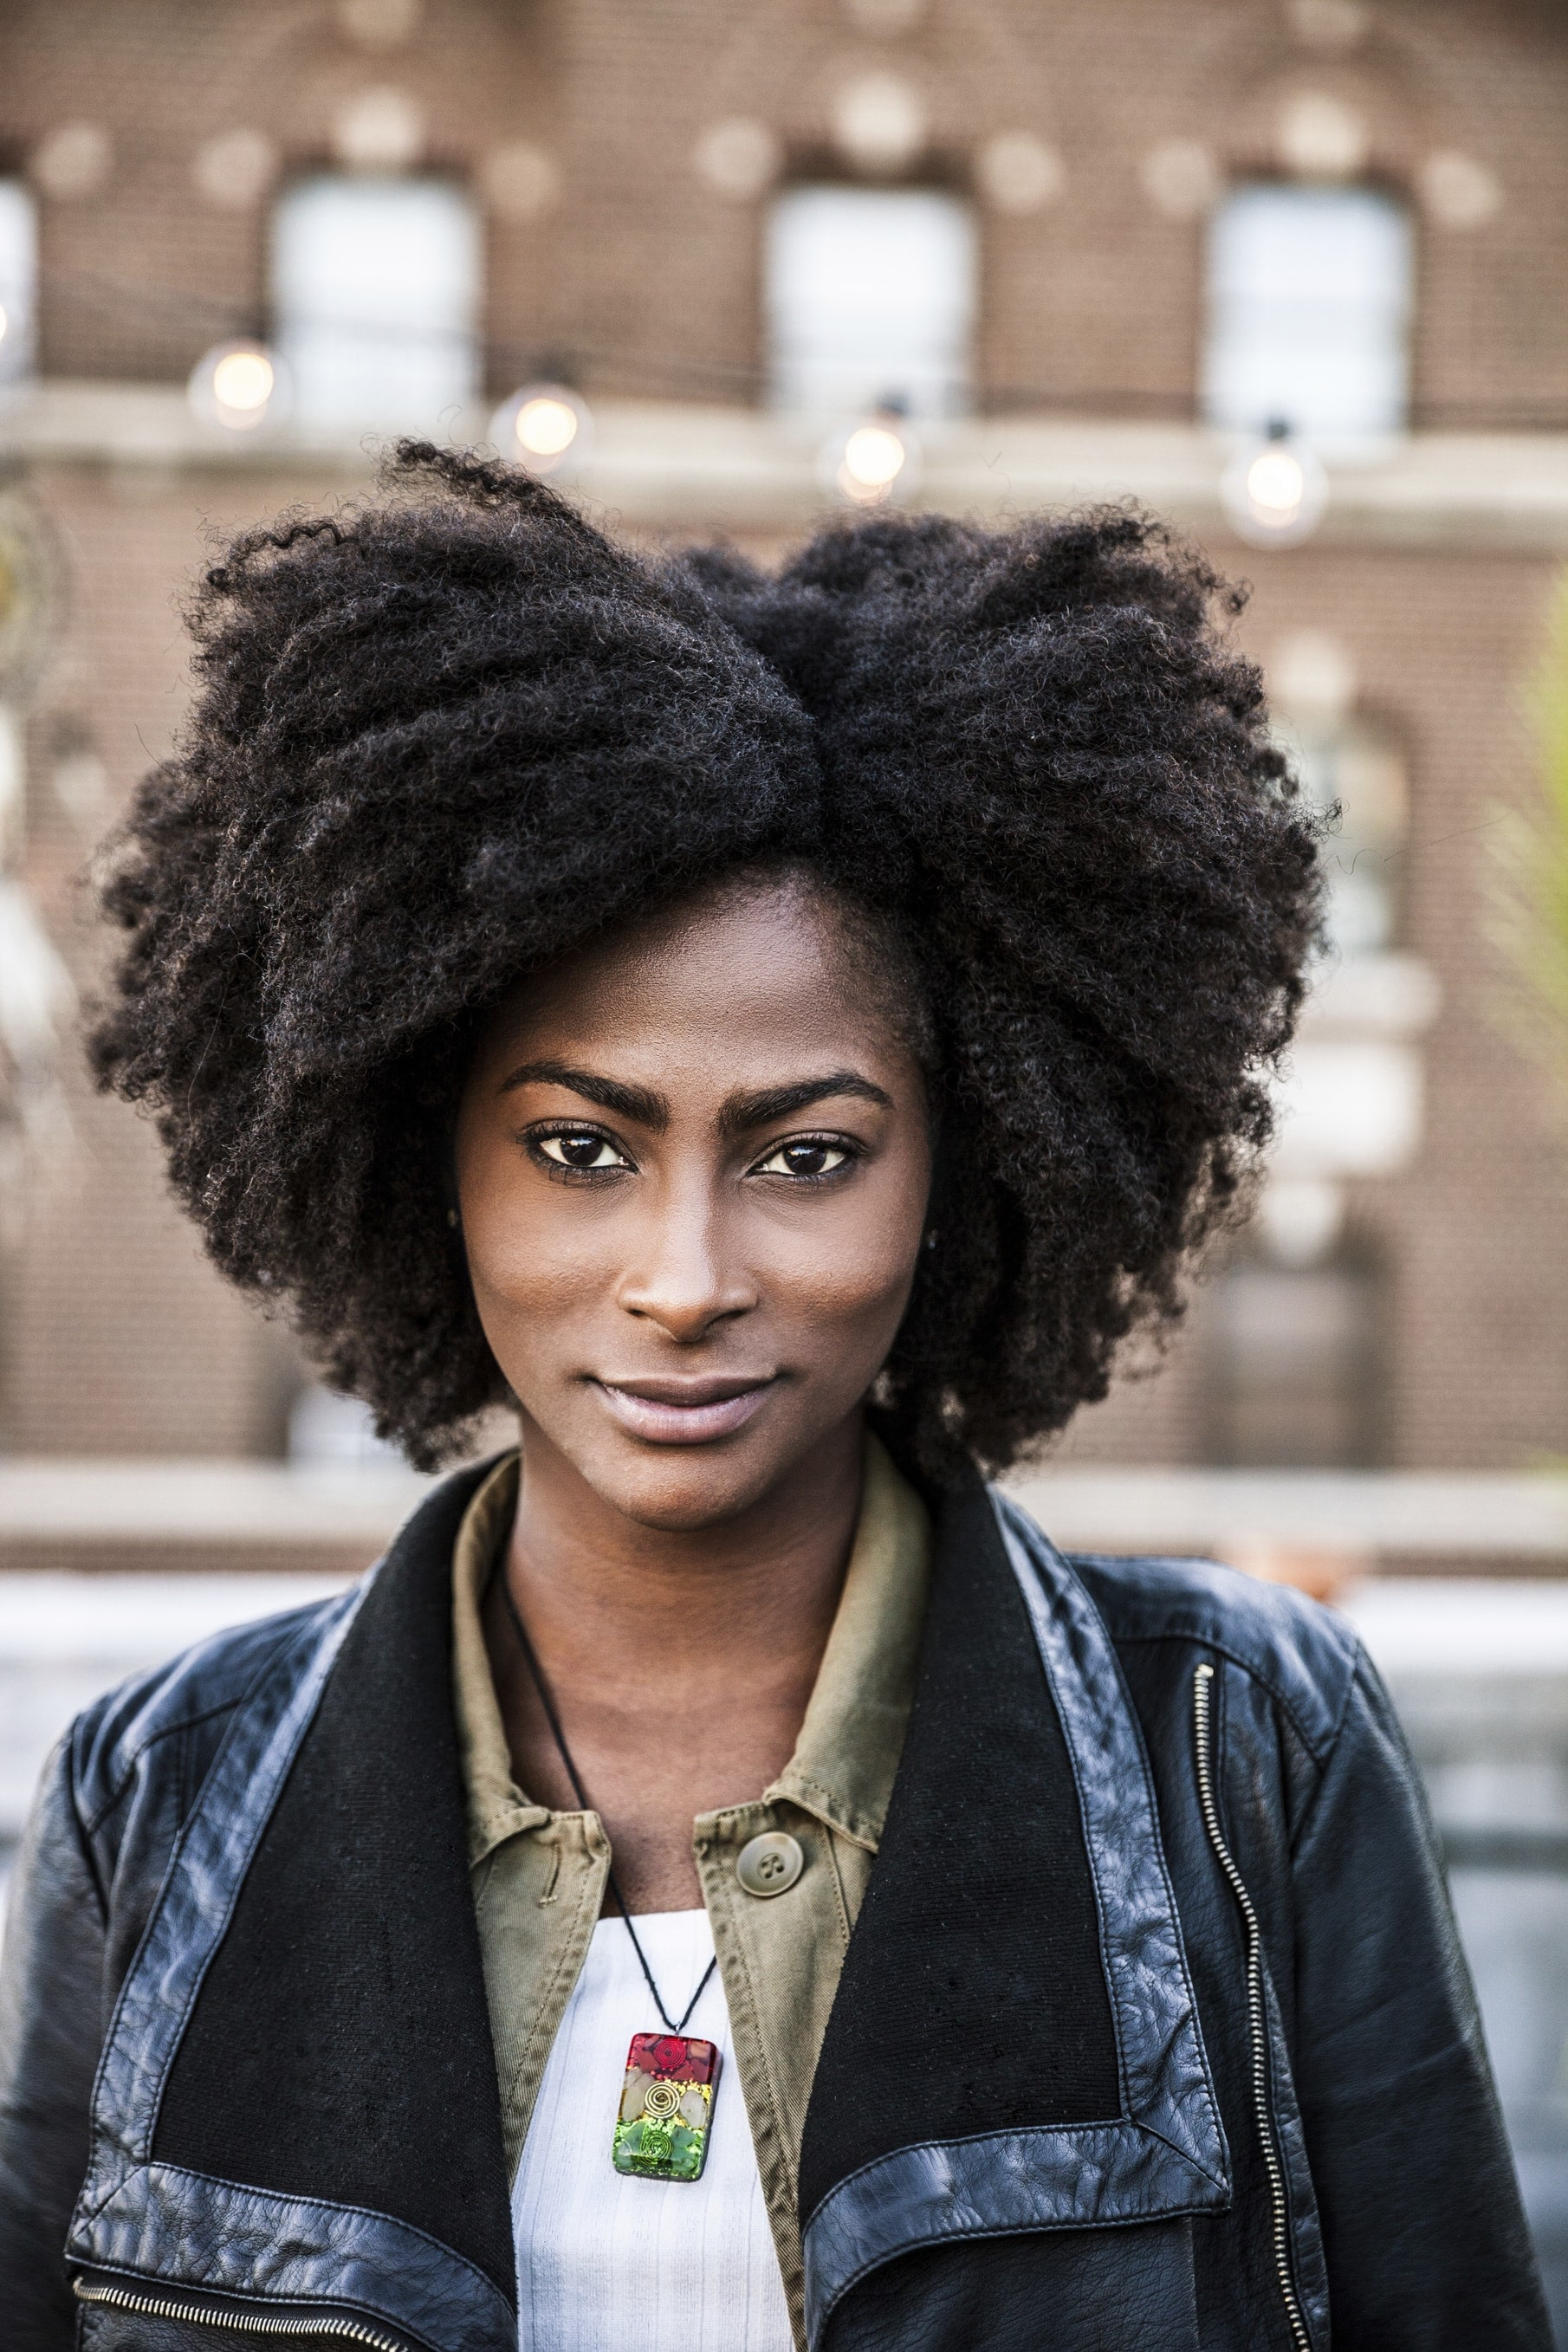 Natural afro hair: black woman with natural hair